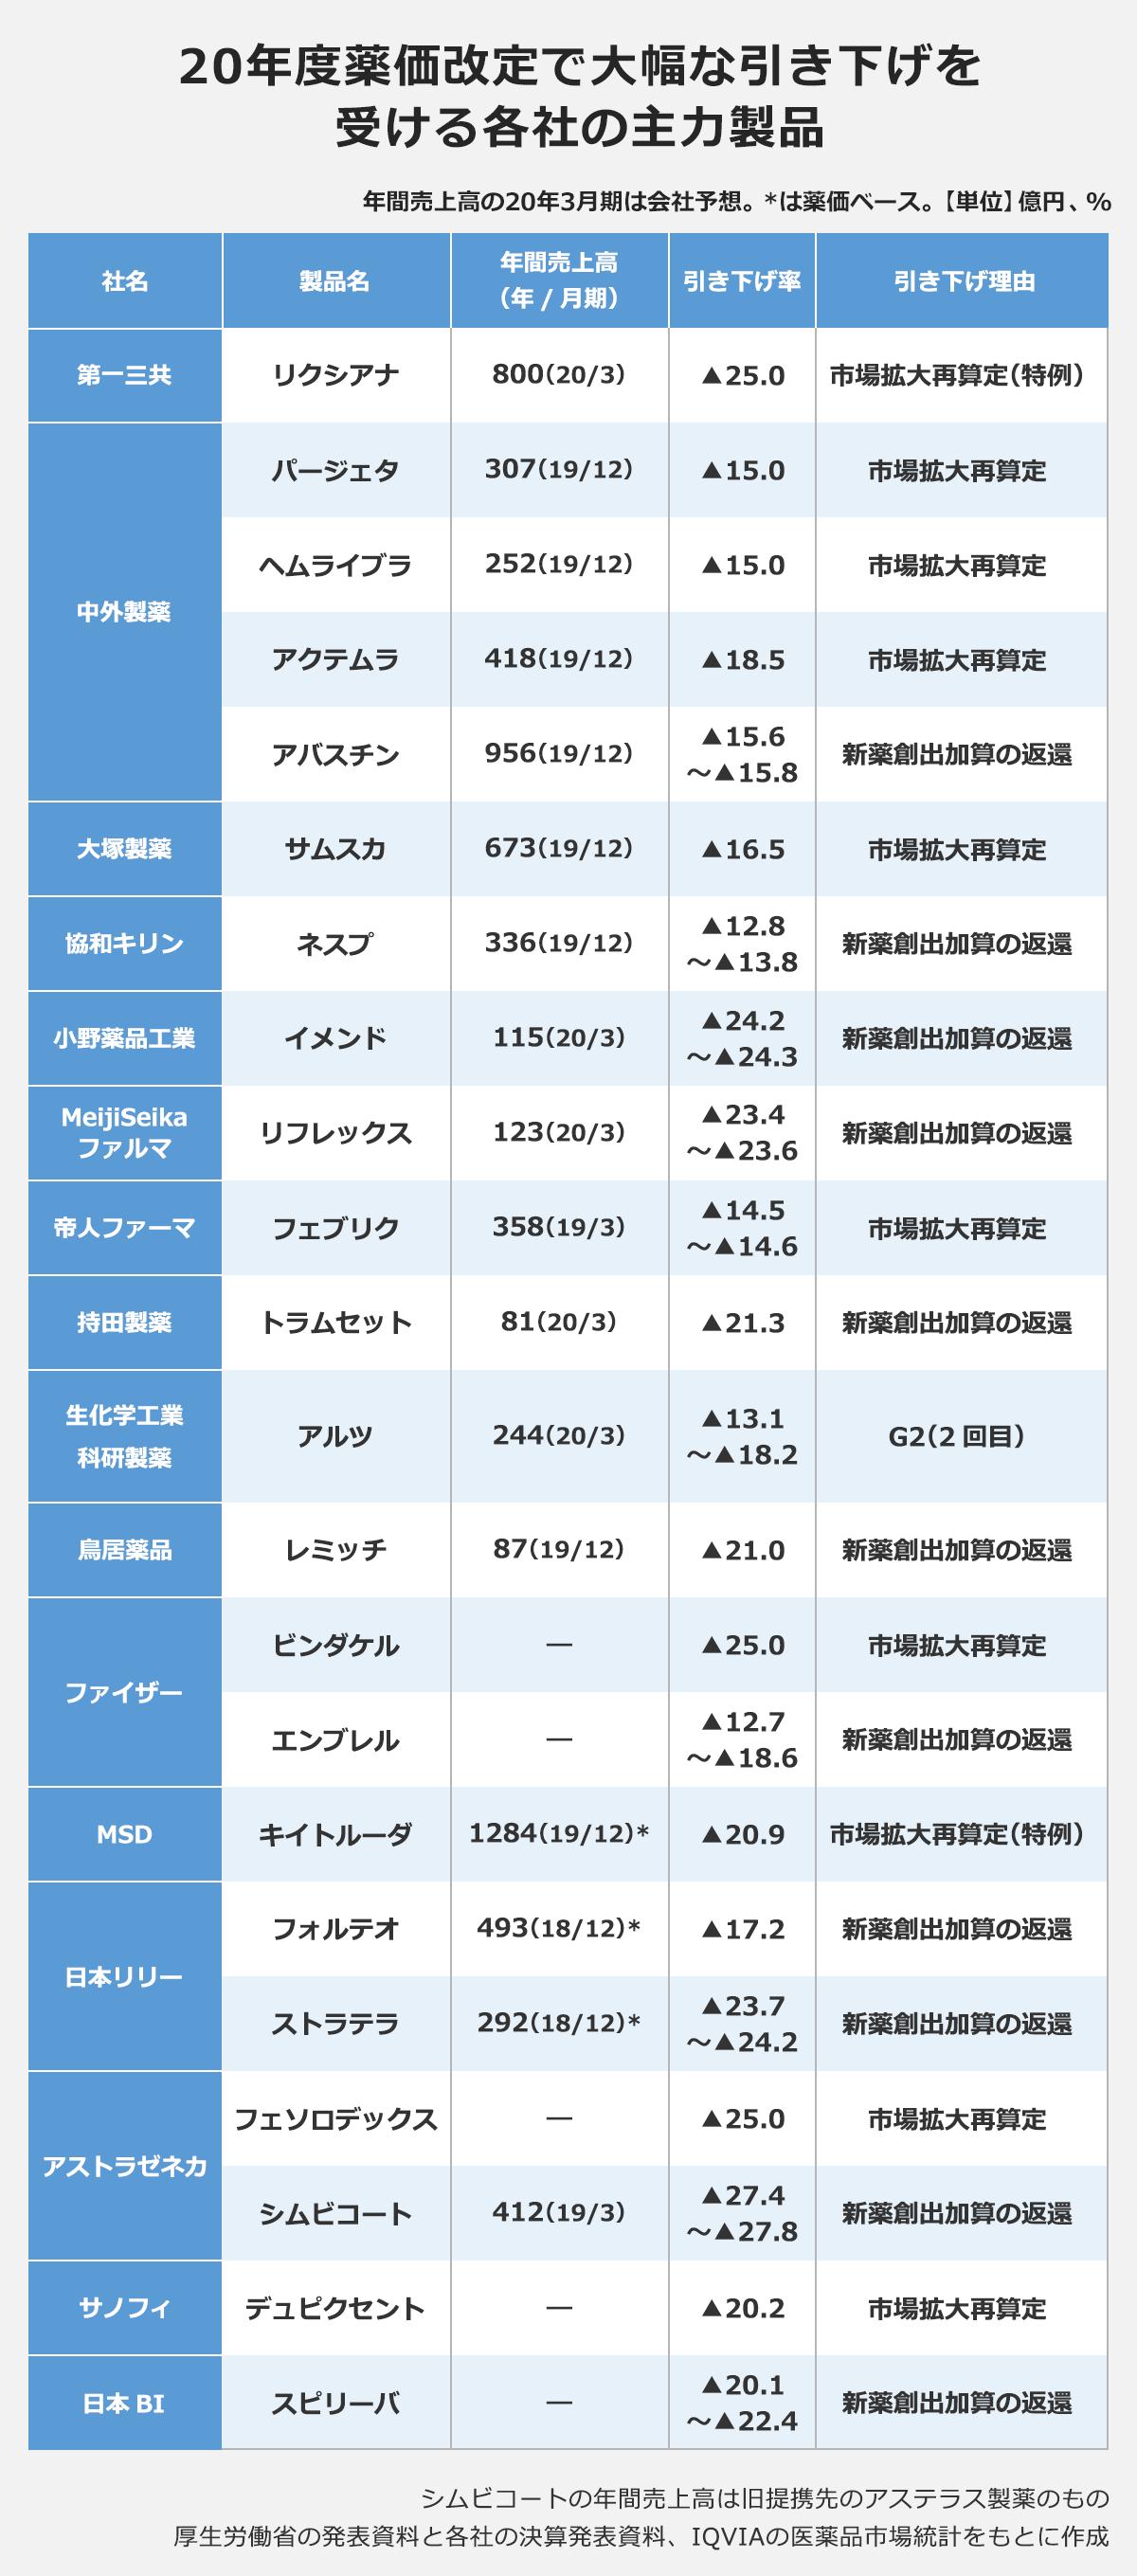 effecrt_NHI_price_revision_02b